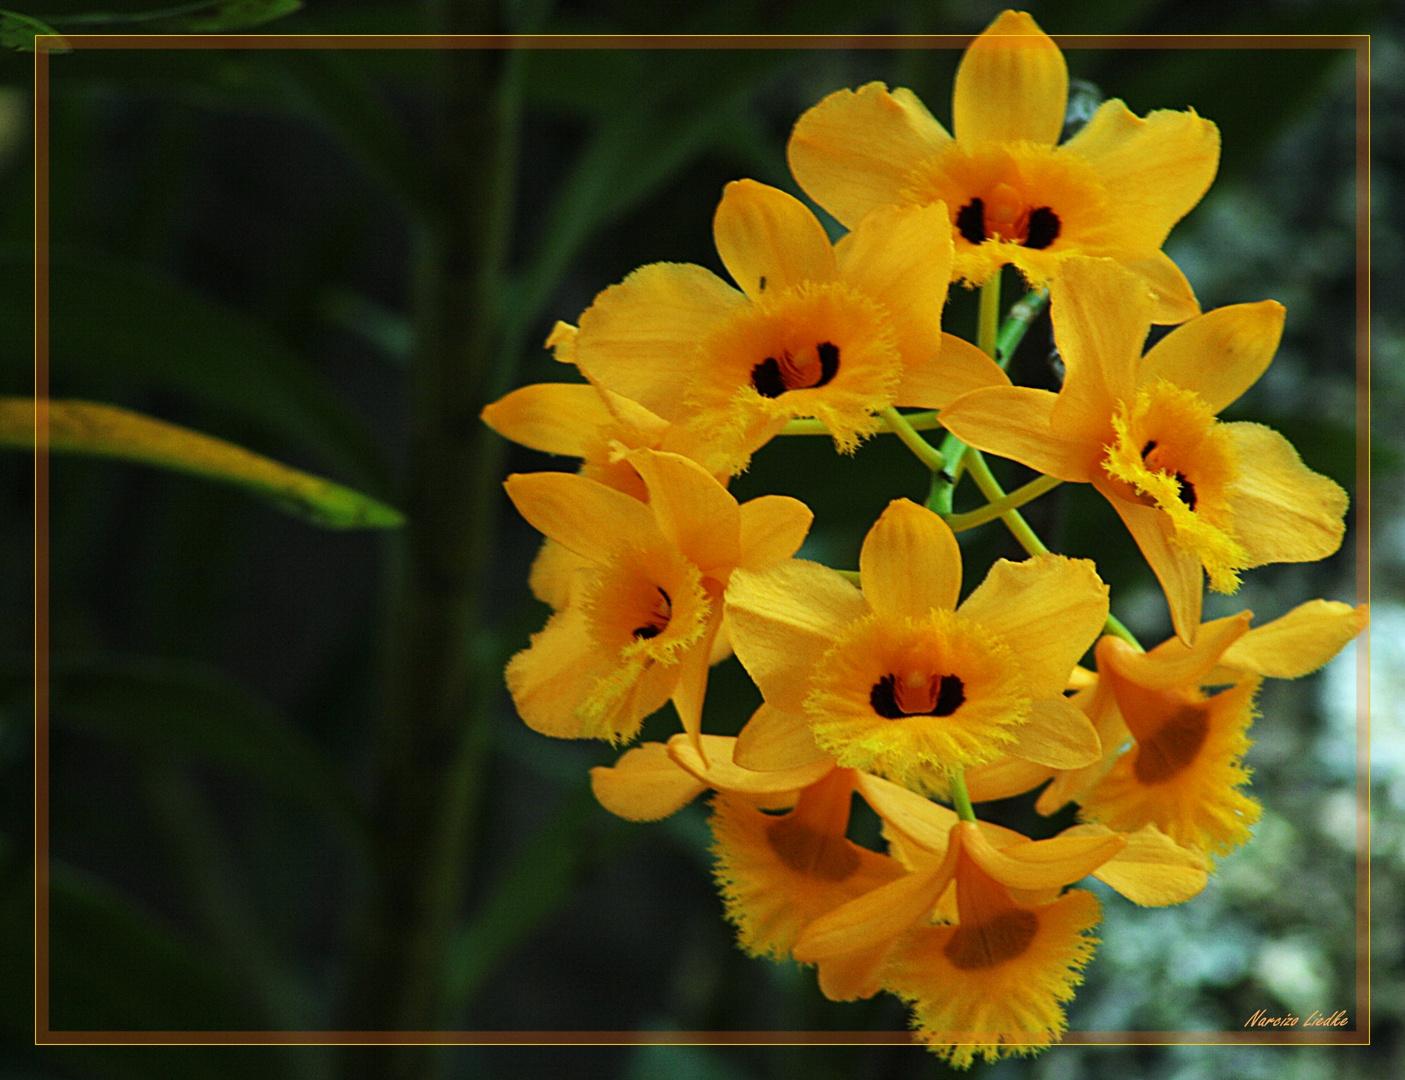 Orquideas douradas